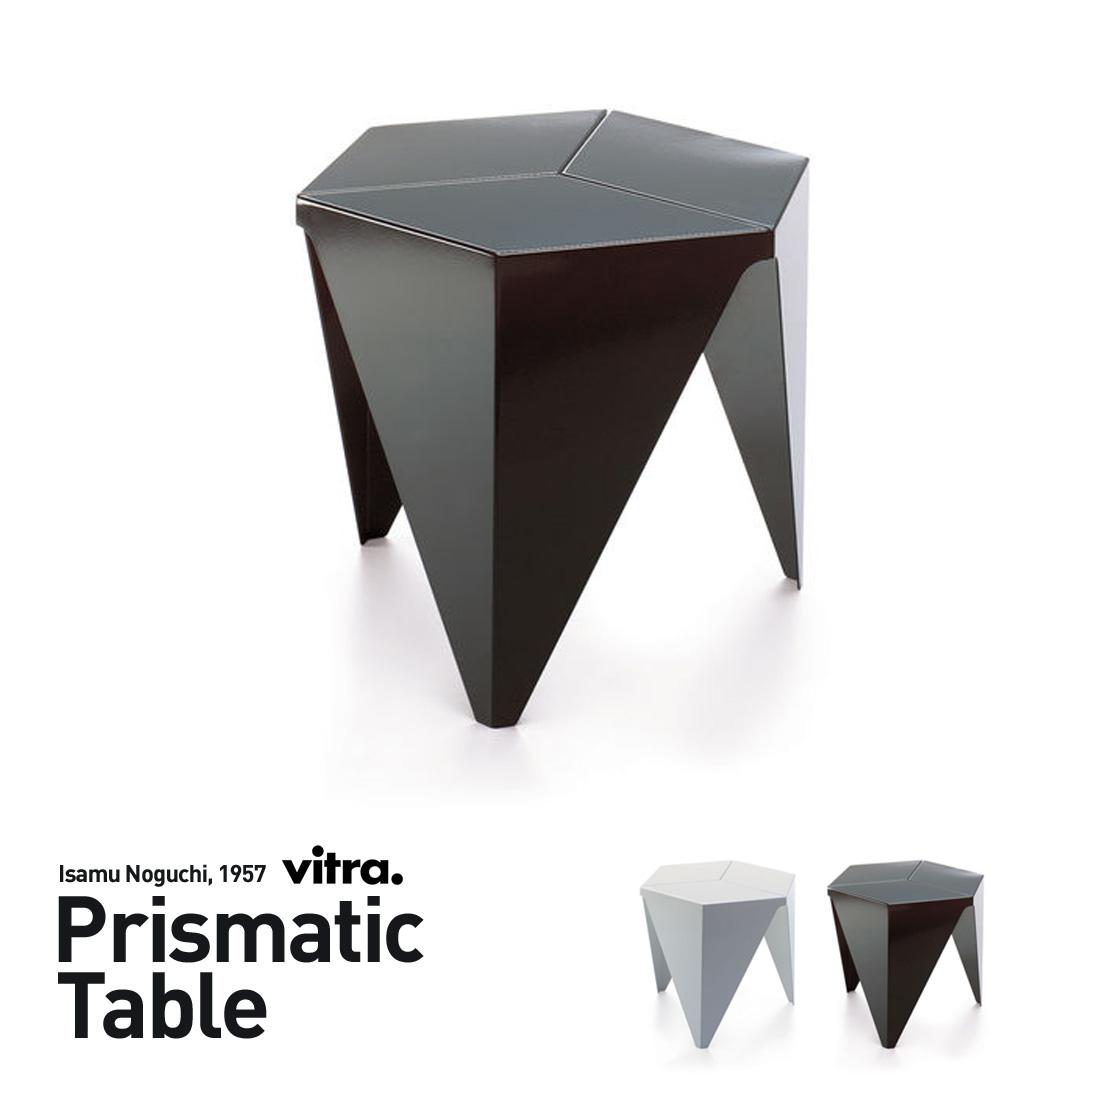 【Vitra】Prismatic Table プリズマティックテーブルヴィトラ/Isamu Noguchi/イサム・ノグチ/テーブル